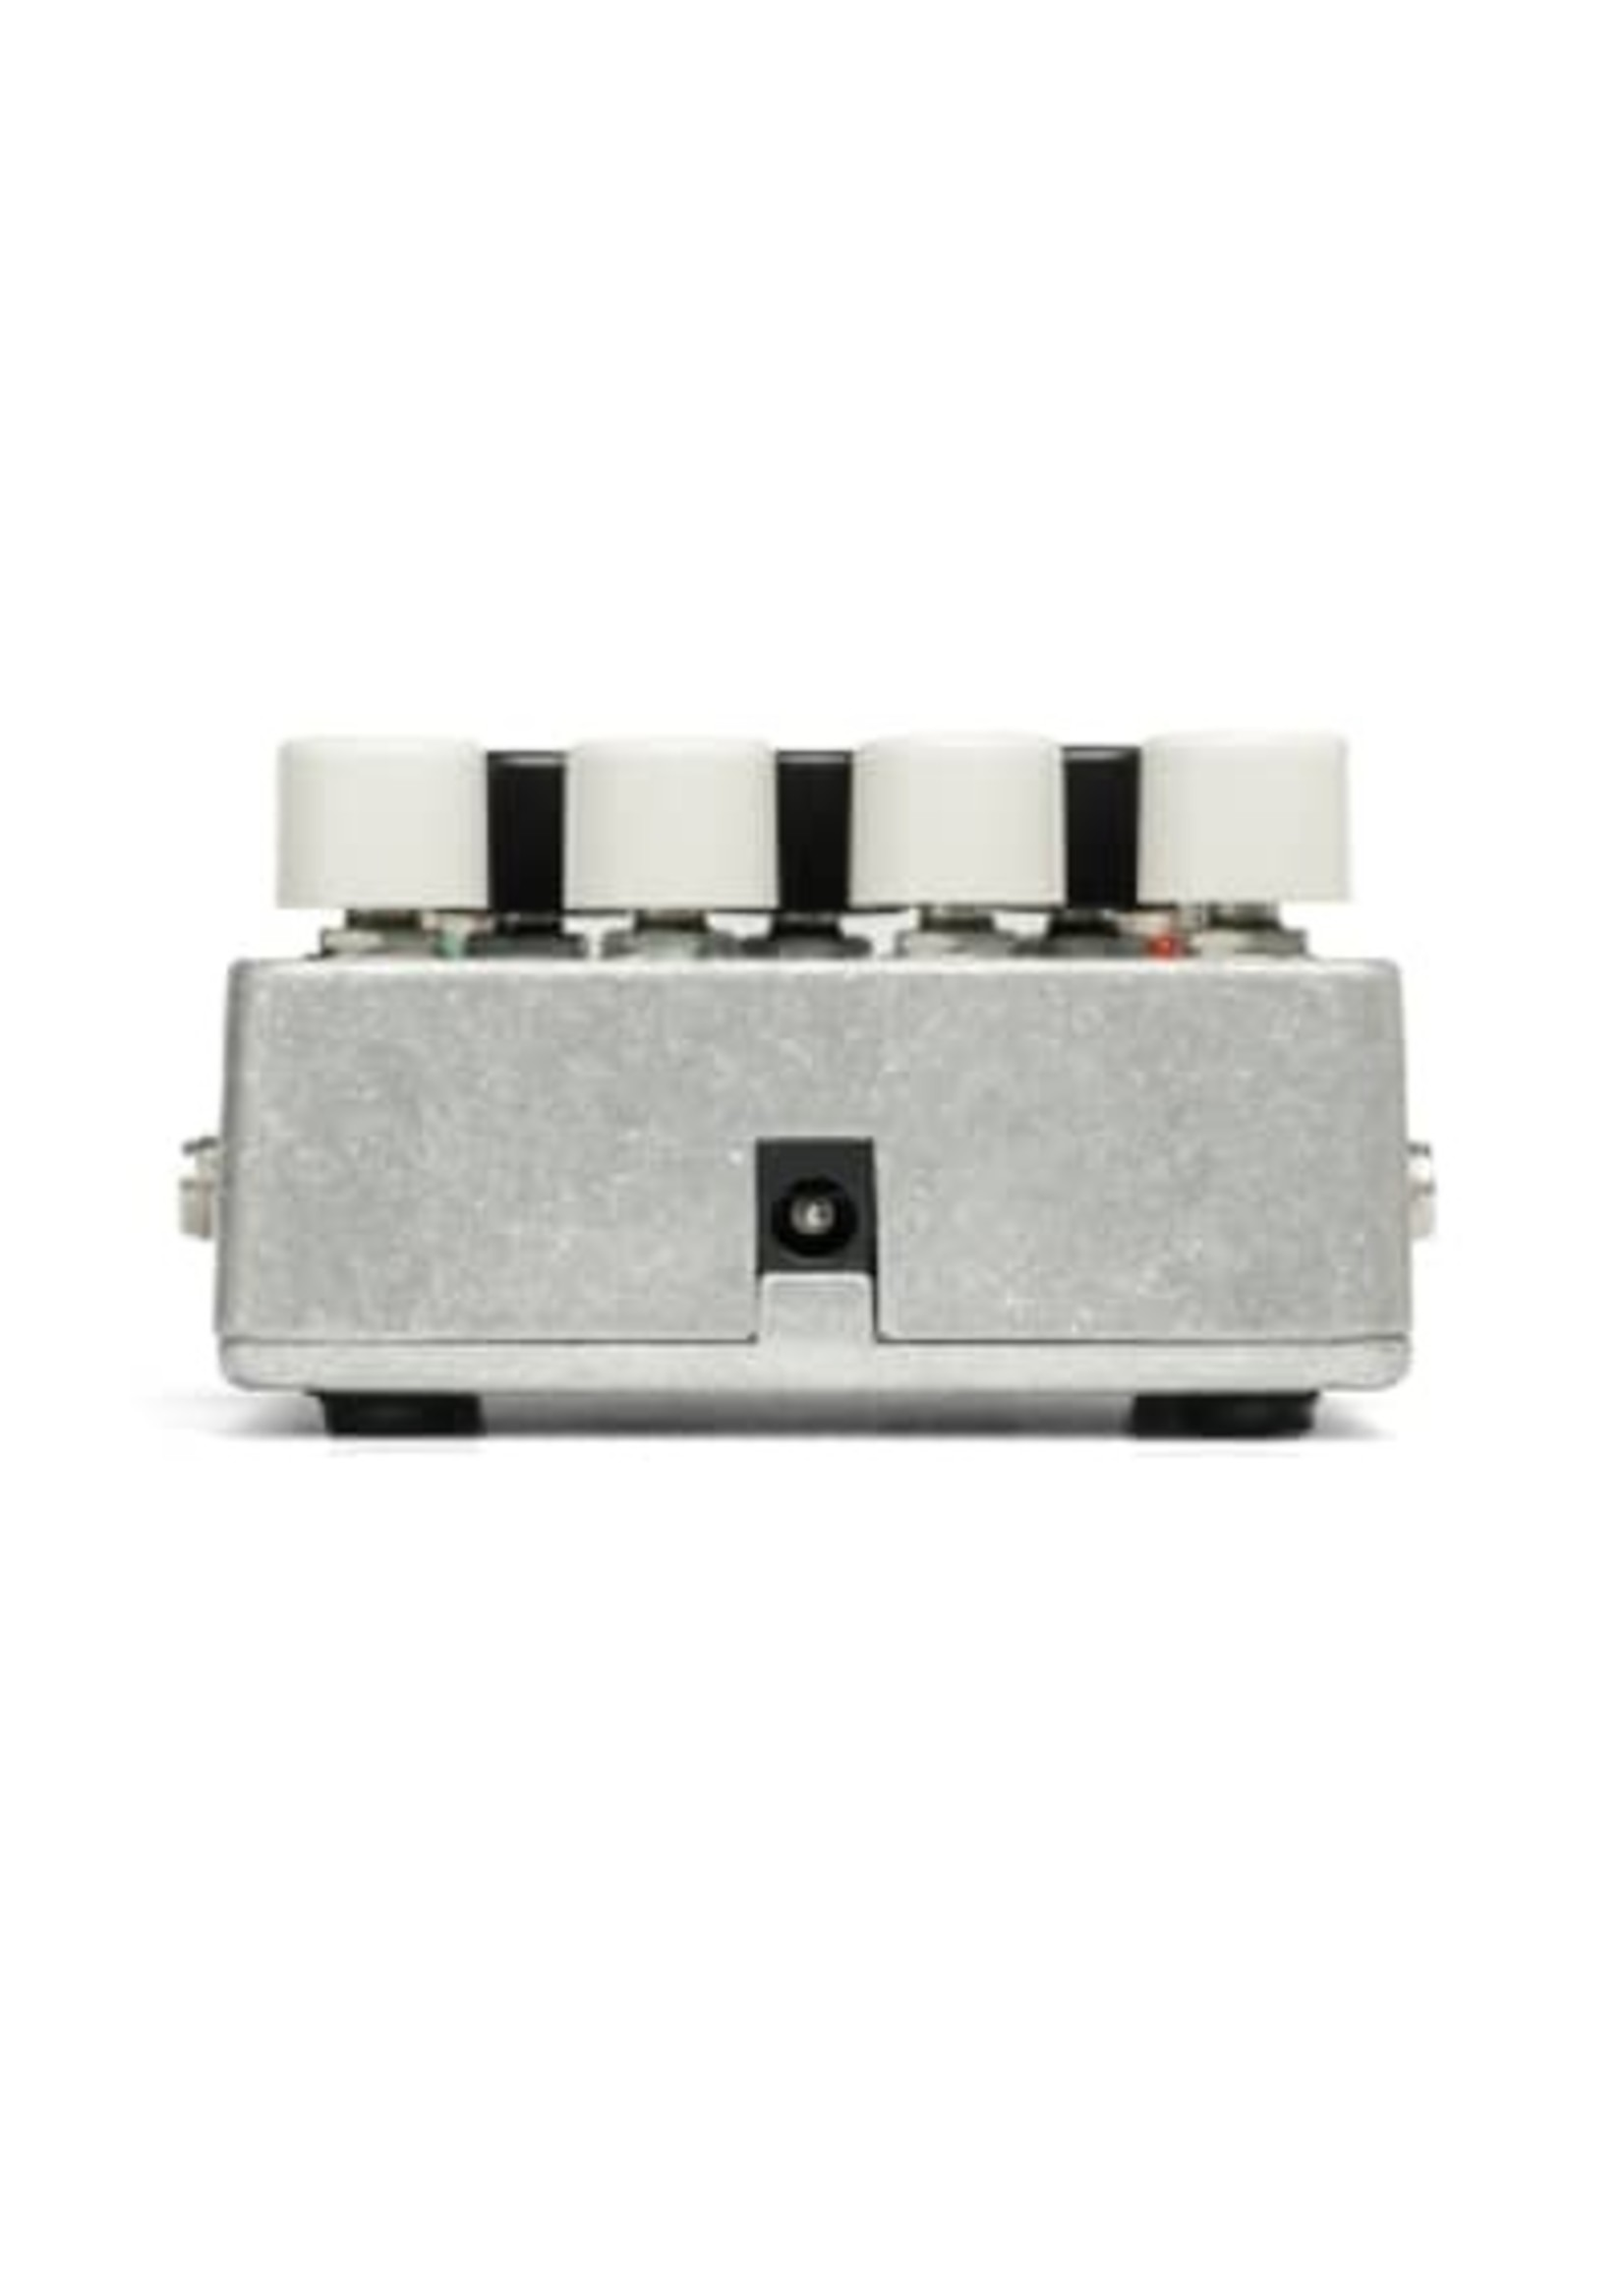 Electro-Harmonix Electro-Harmonix Hot Wax Dual Overdrive Pedal